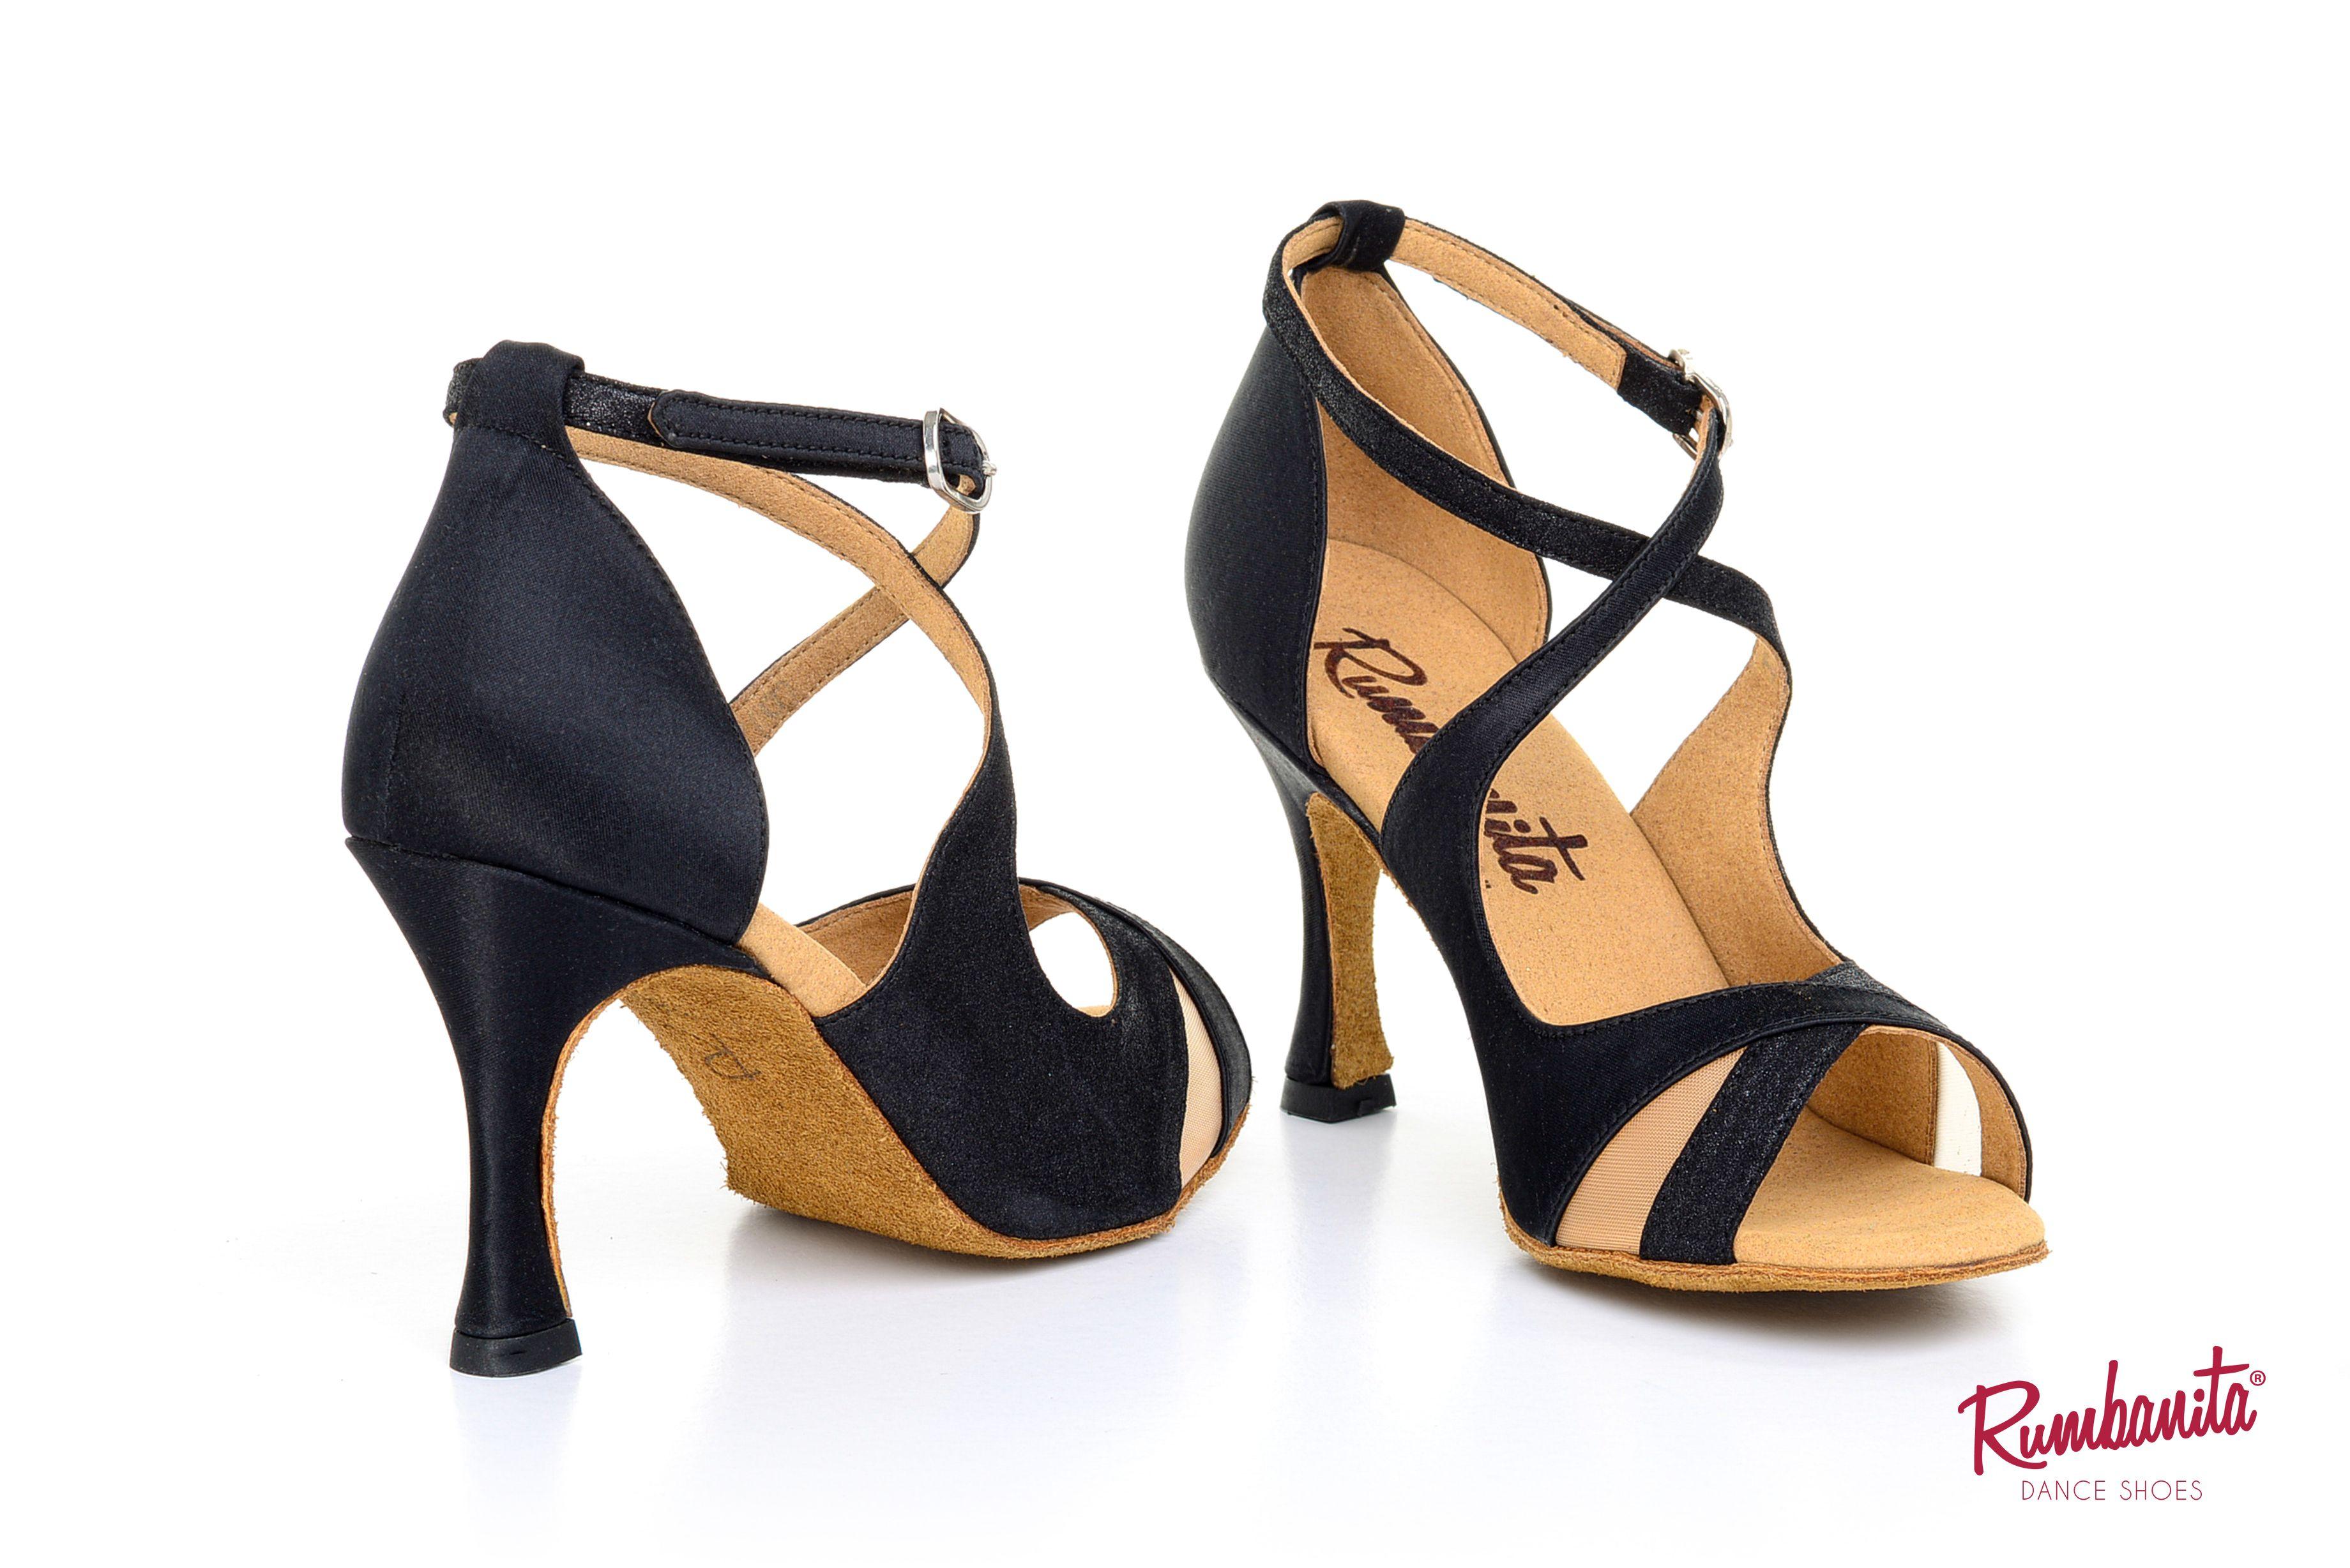 992bbaa24 Lagarriga Black by Rumbanita dance shoes. Perfect for social dance like  salsa, bachata,